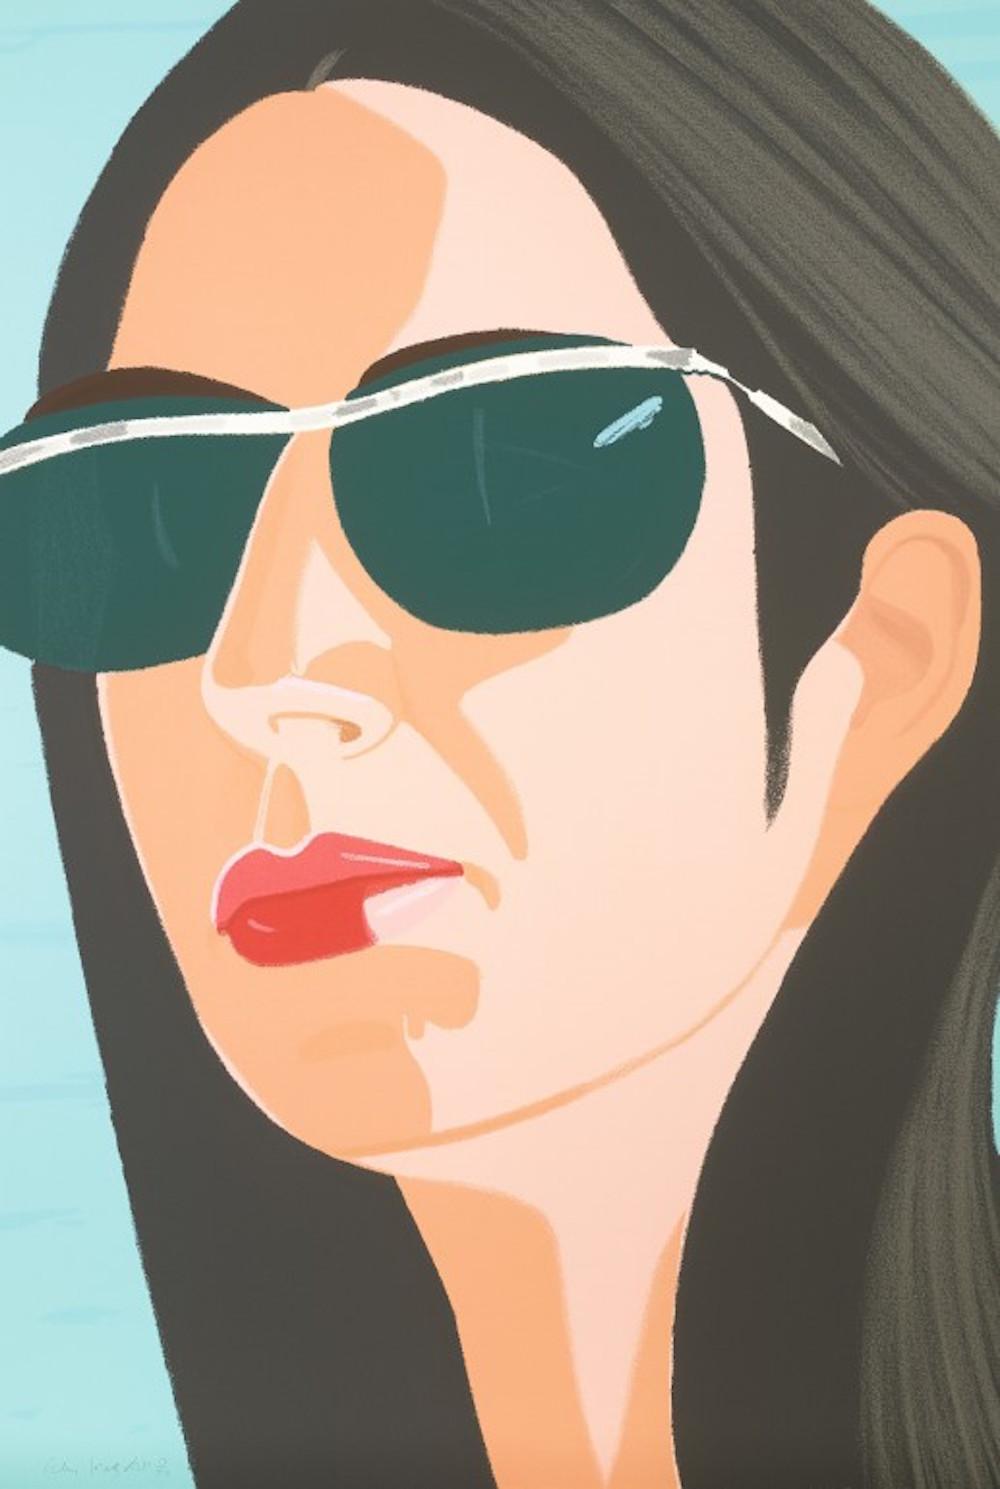 Ada with Sunglasses (Alex and Ada Suite) by Alex Katz